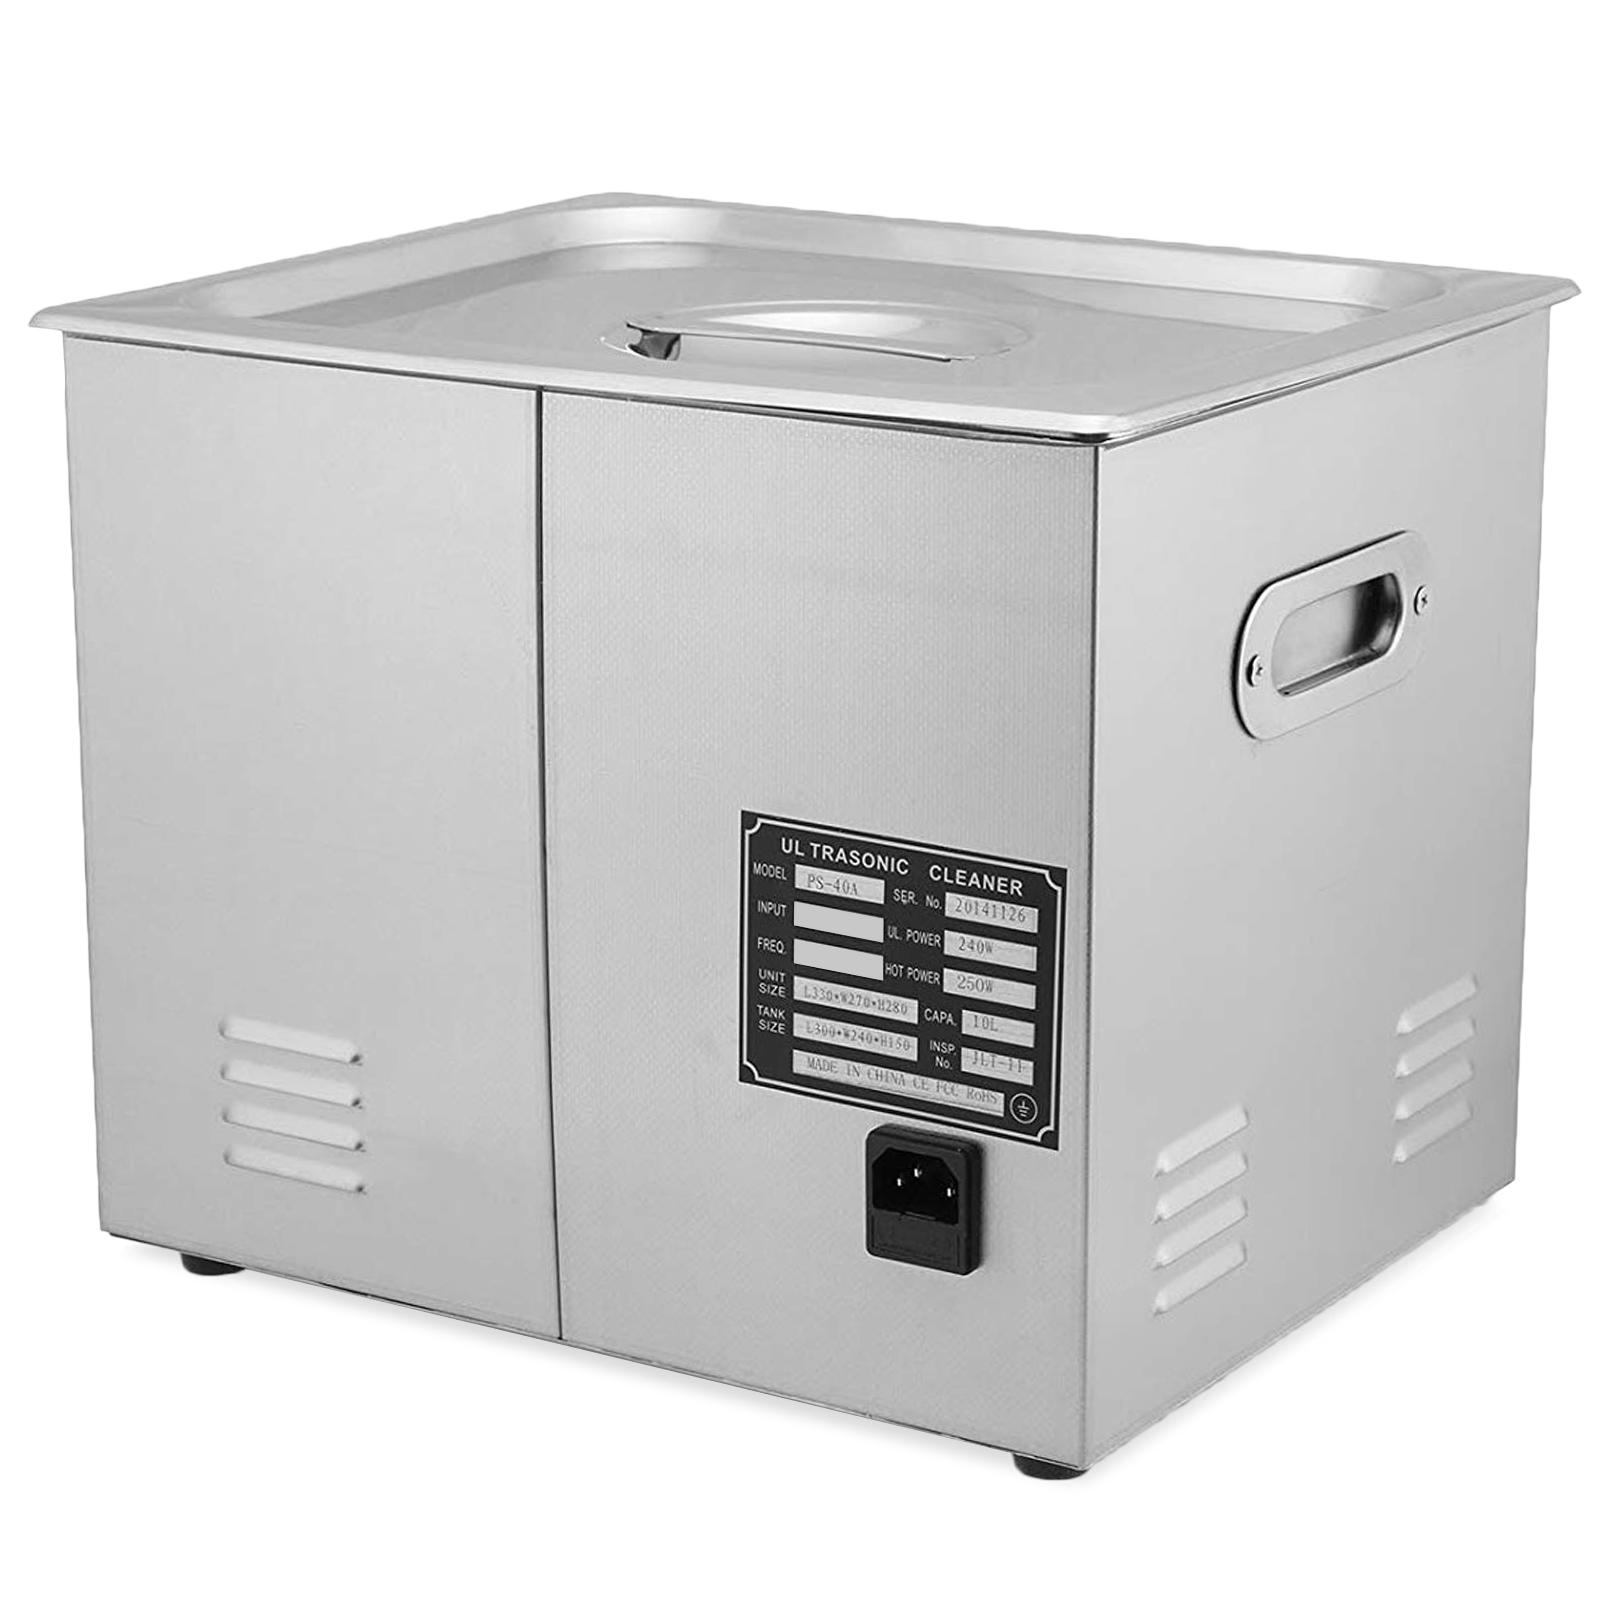 Vaschetta-Vasca-Ultrasuoni-Lavatrice-Pulitore-Ad-Ultrasuoni miniatura 64